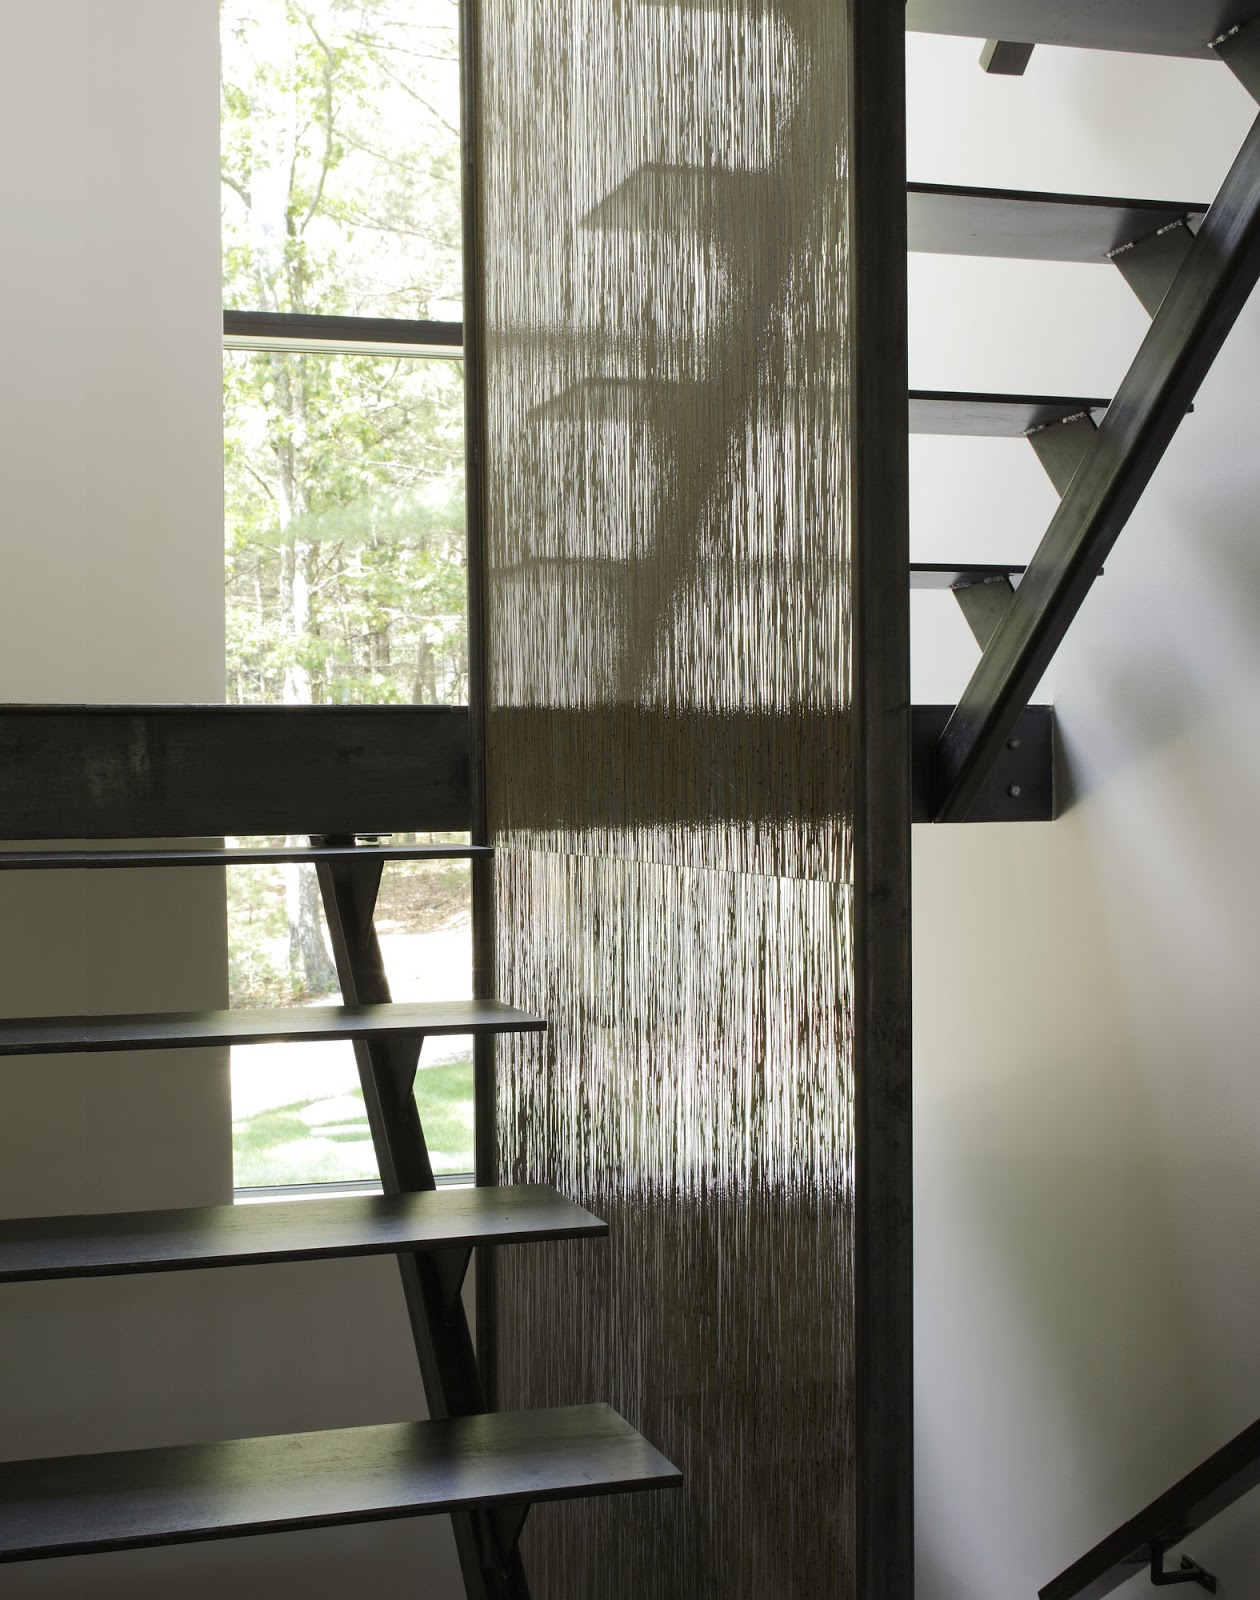 mẫu-cầu-thang-sắt